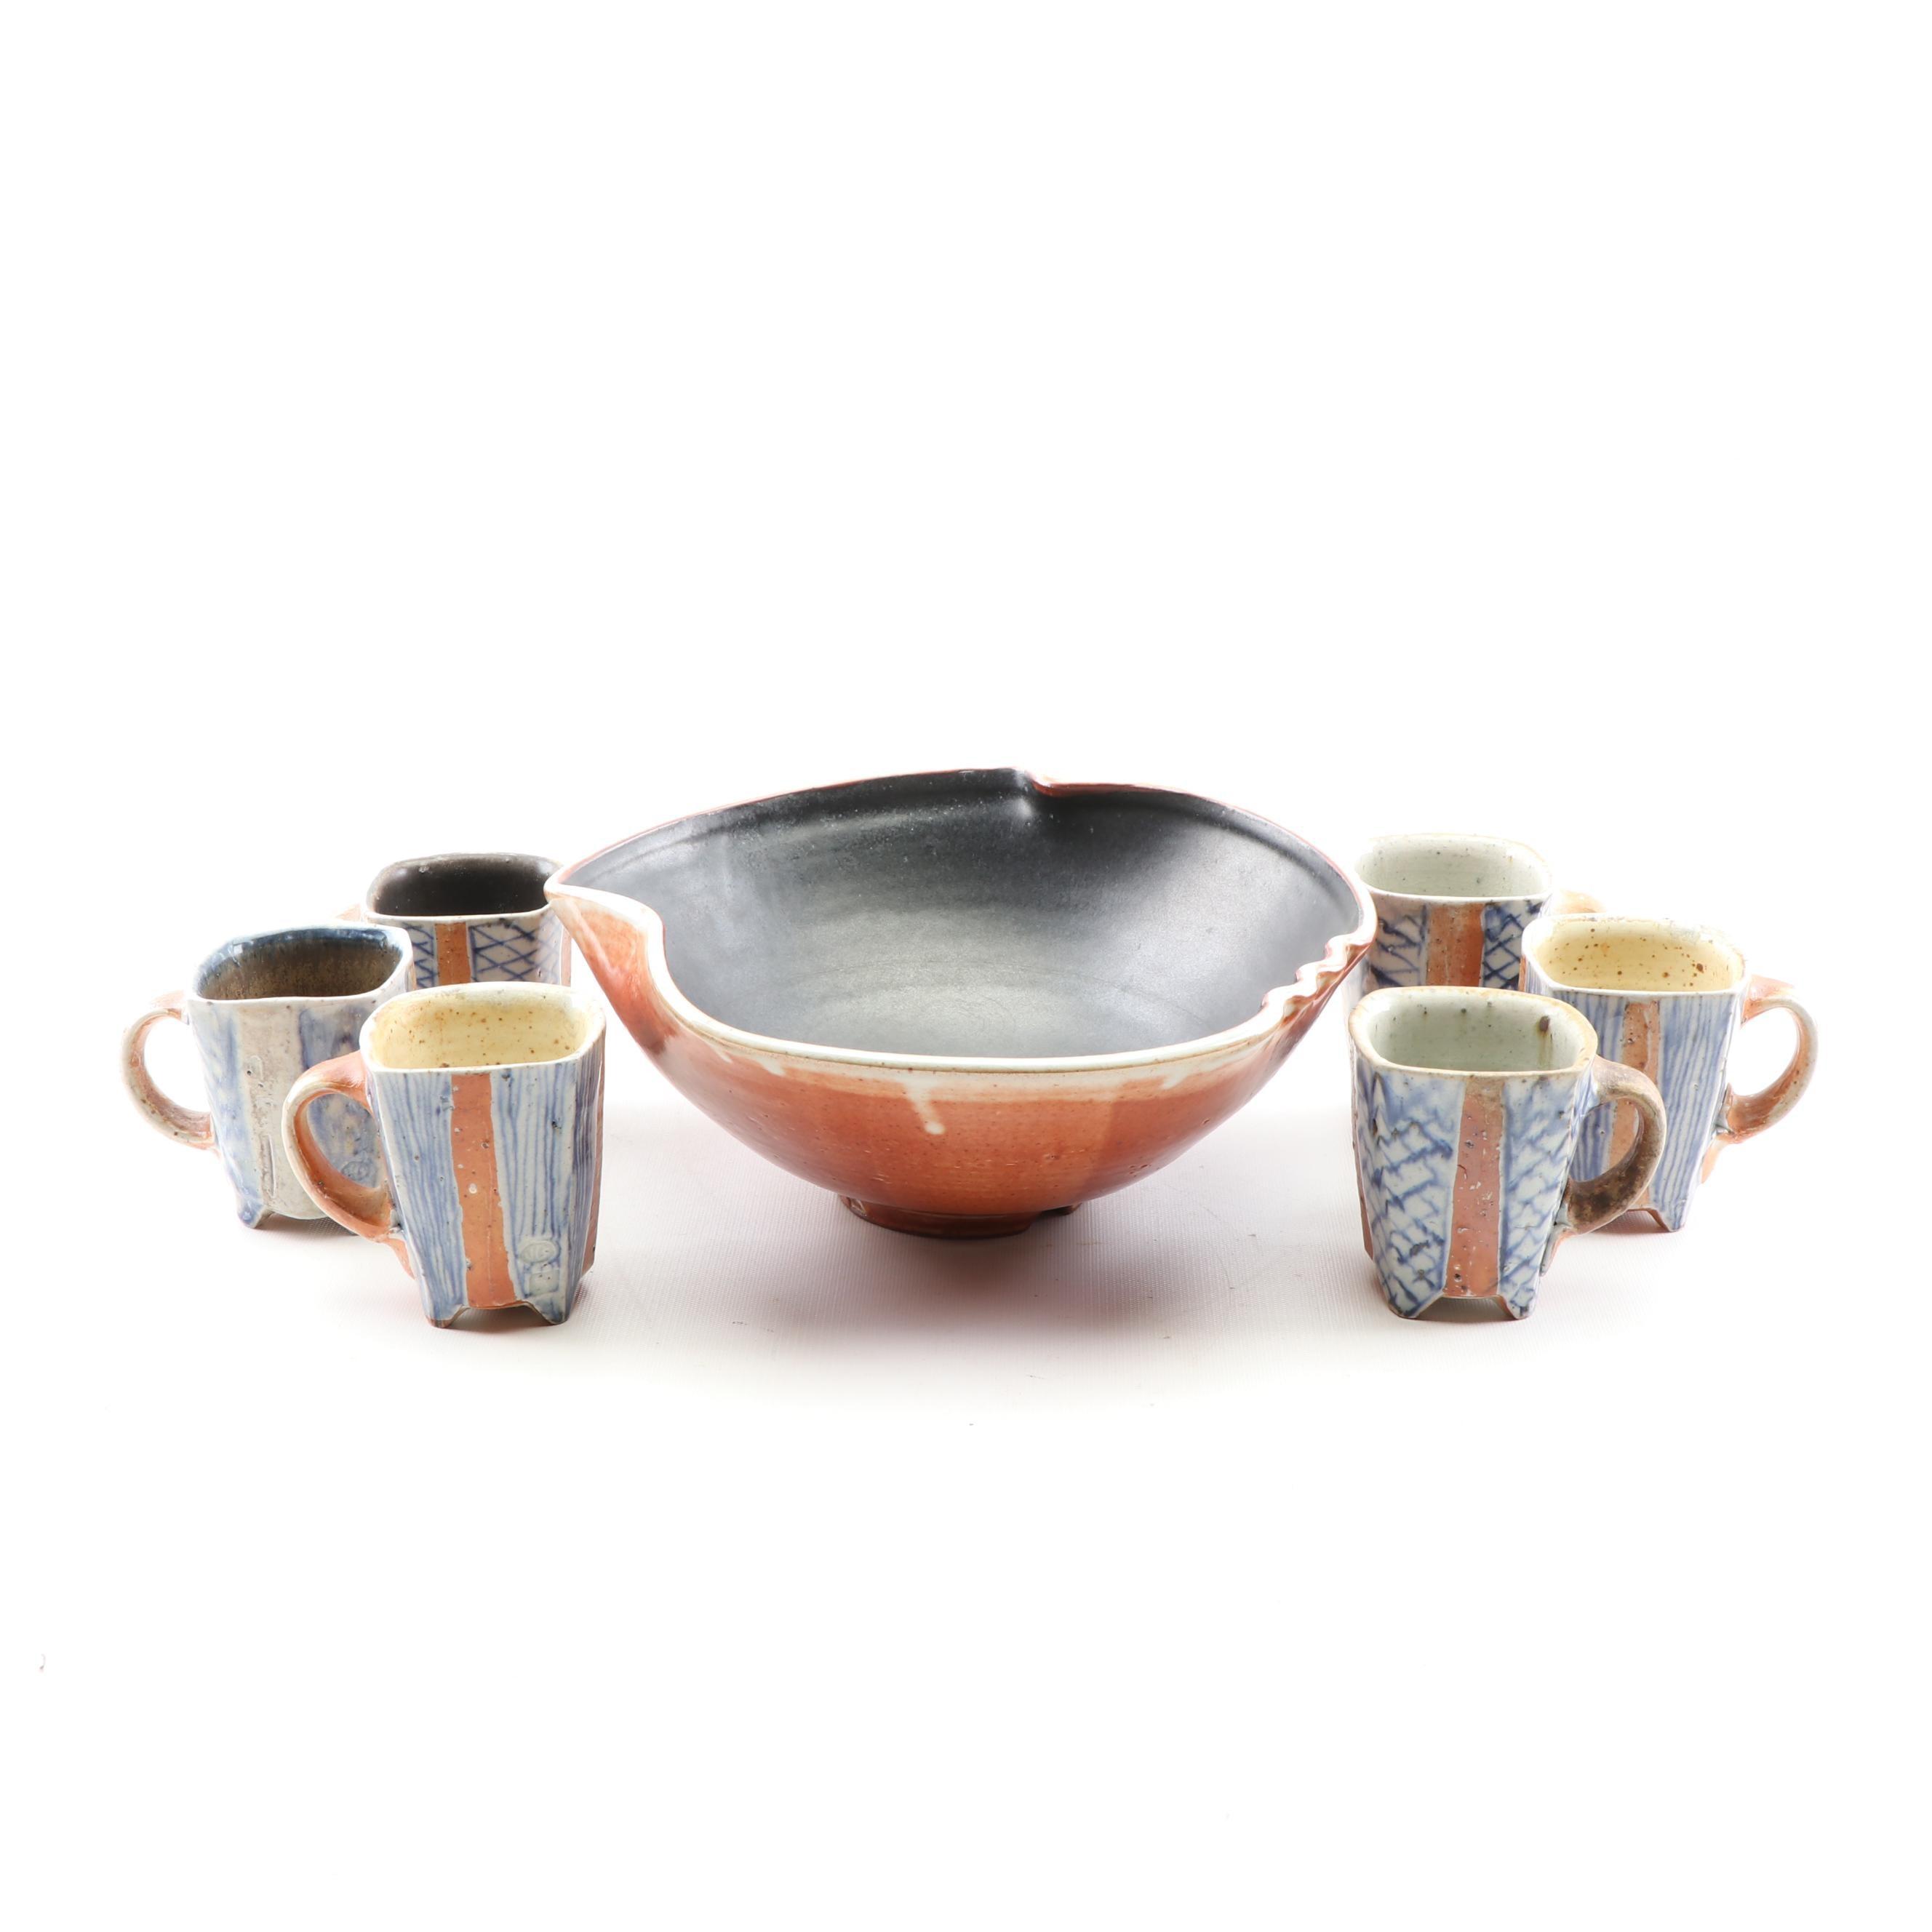 Jason Bohmert Wood Fired Stoneware Mugs and Serving Bowl